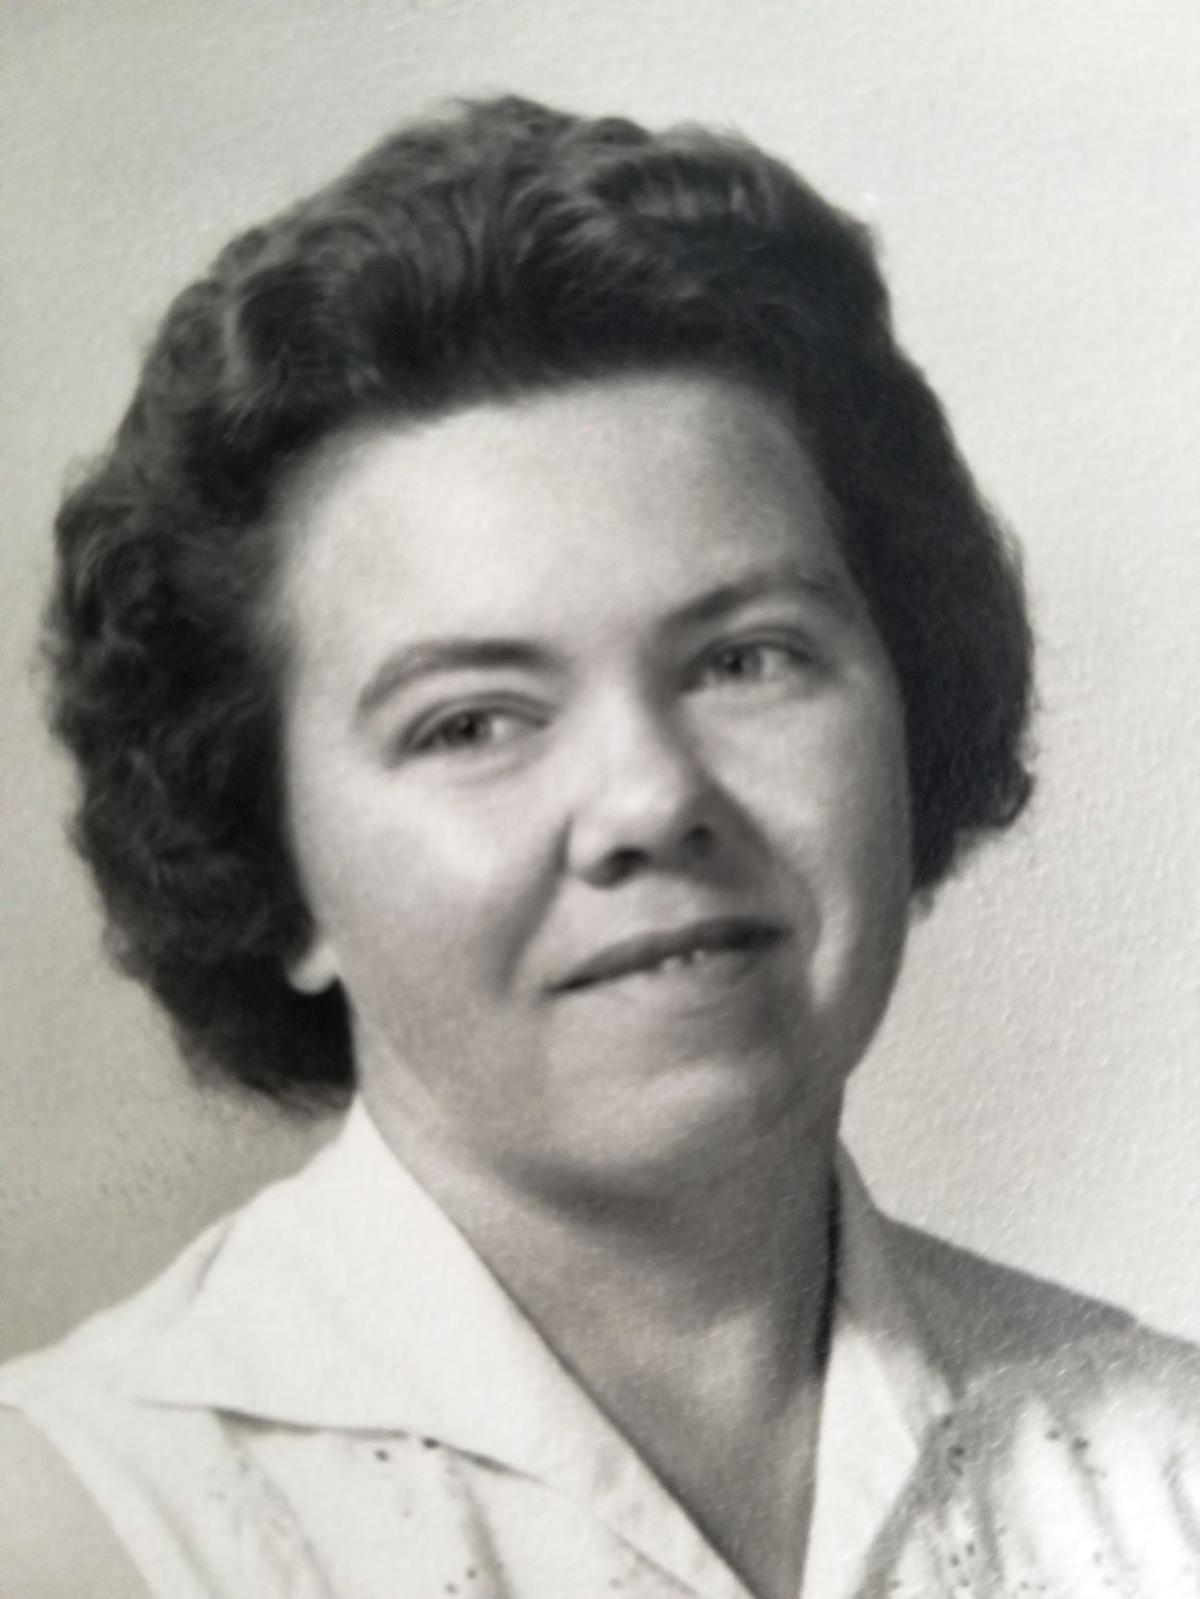 Evelyn Wortman